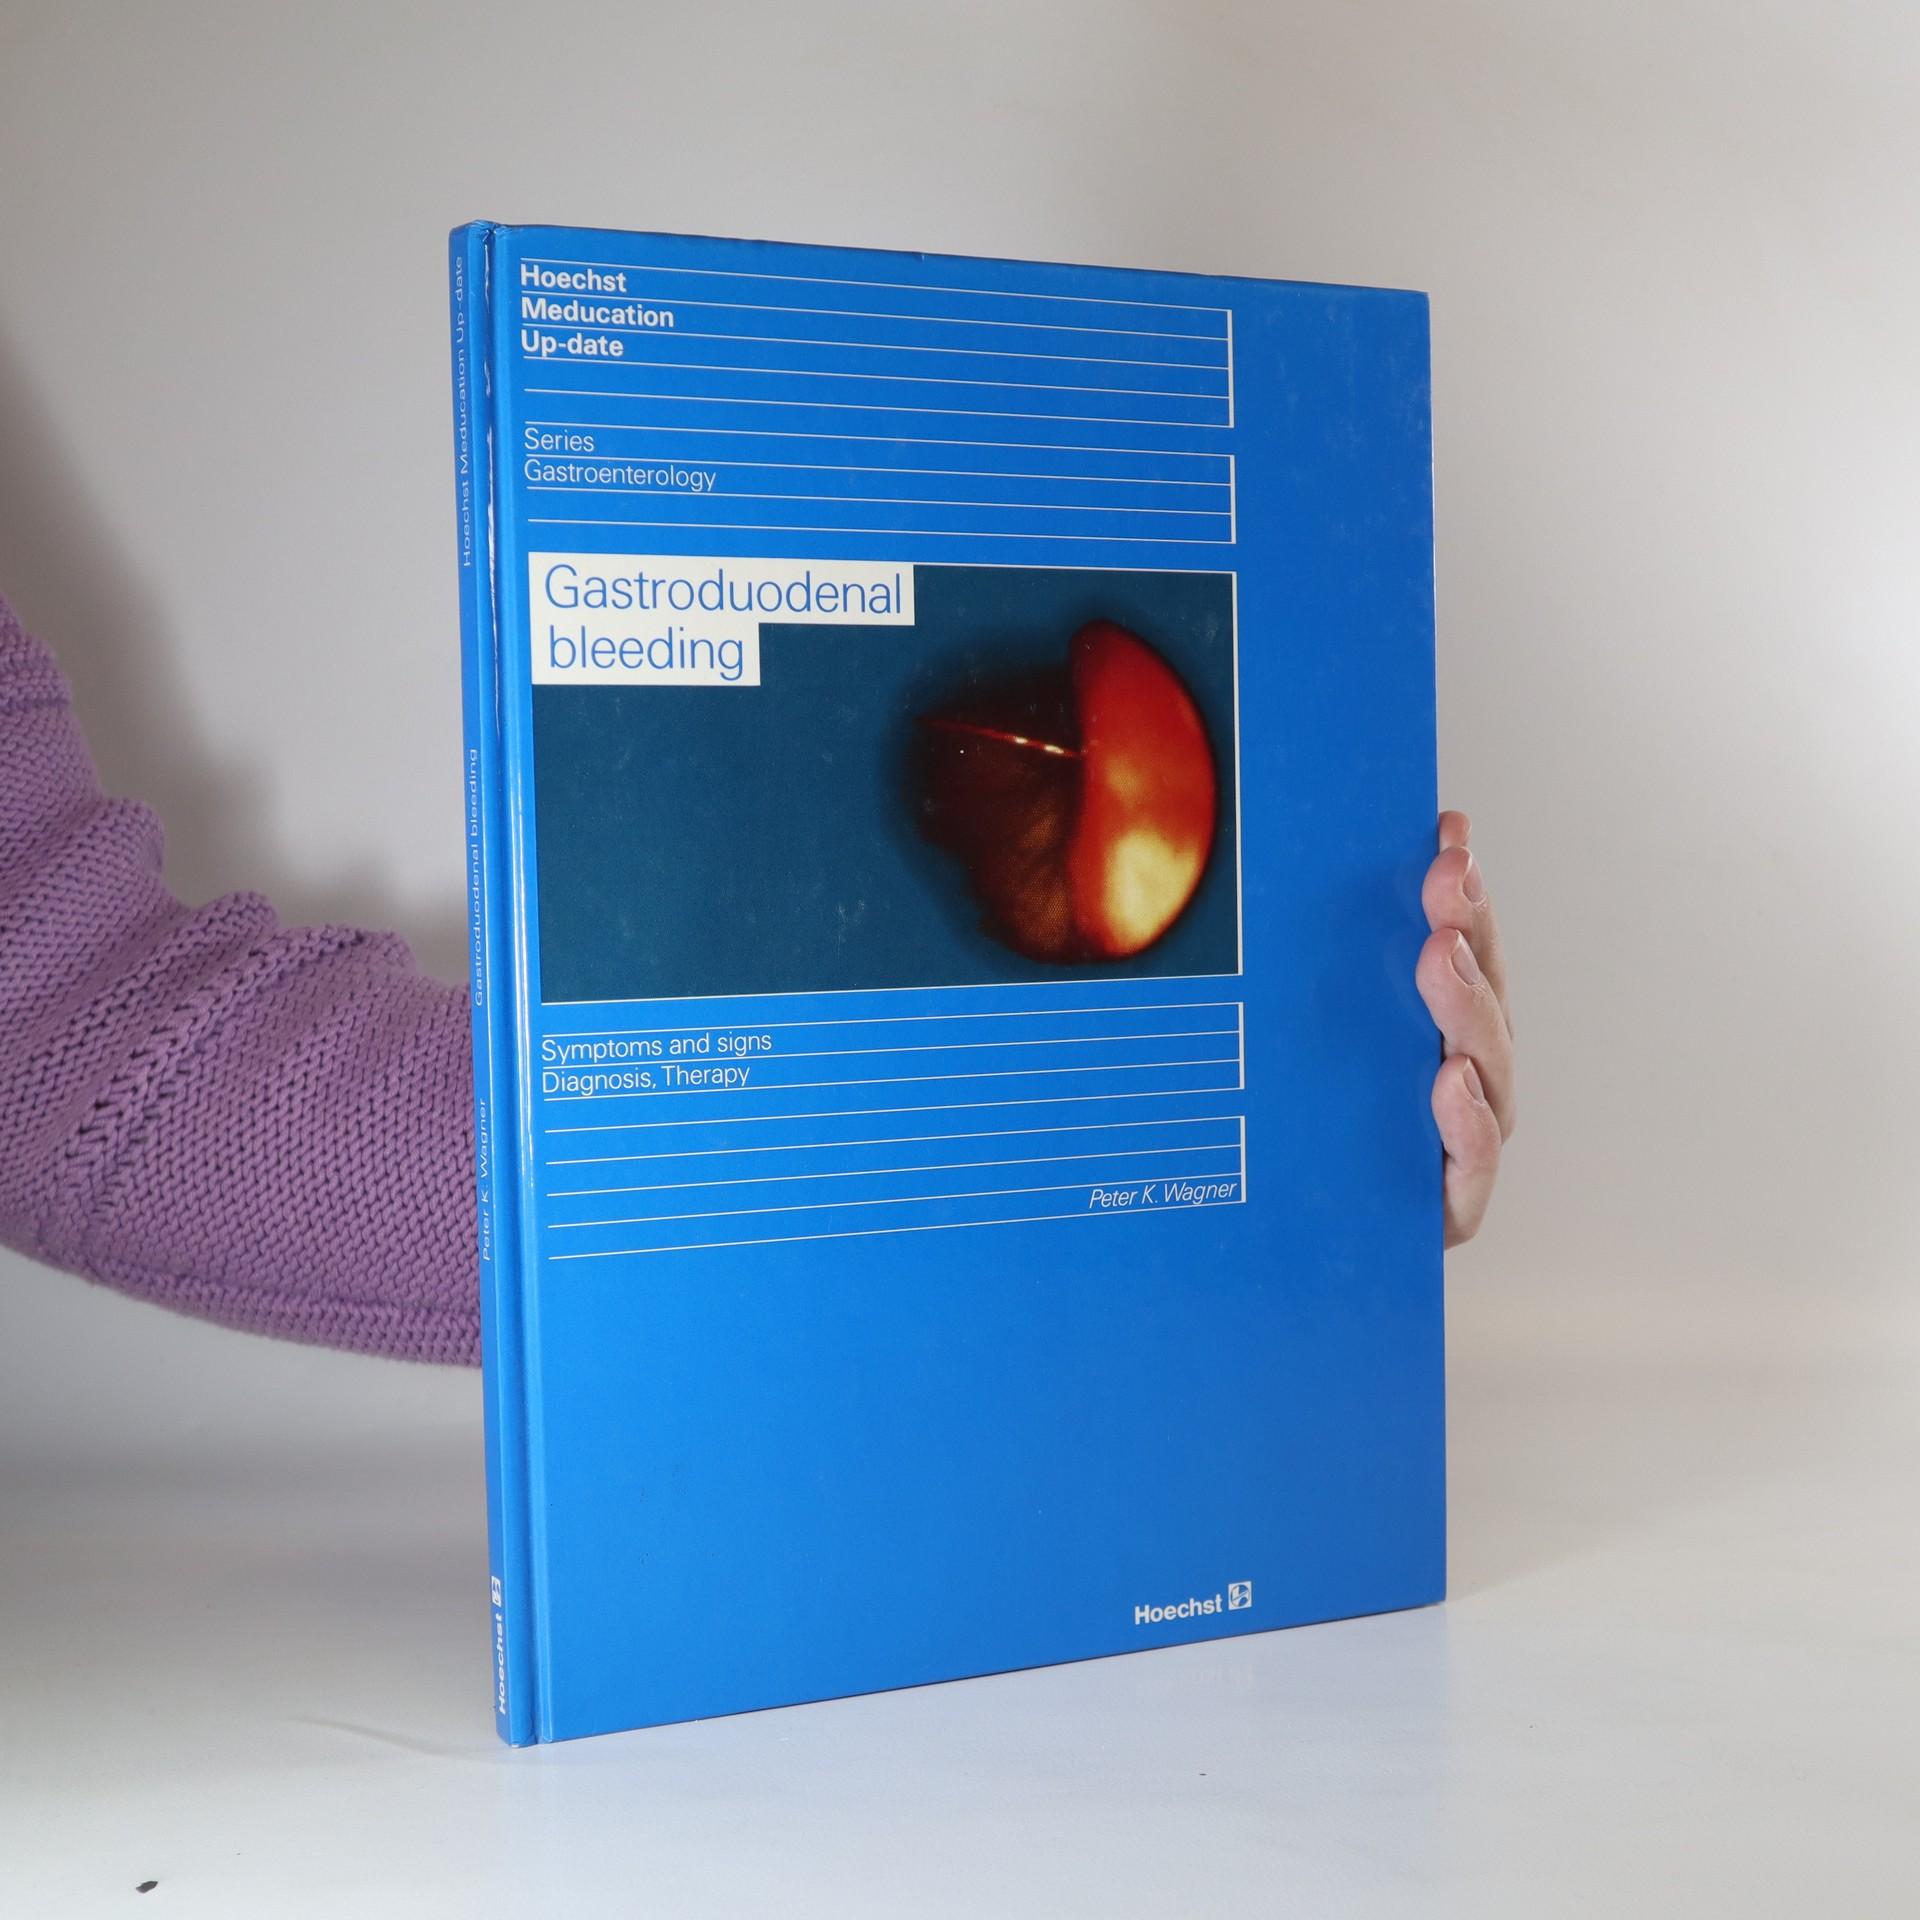 antikvární kniha Gastroduodenal bleeding, neuveden